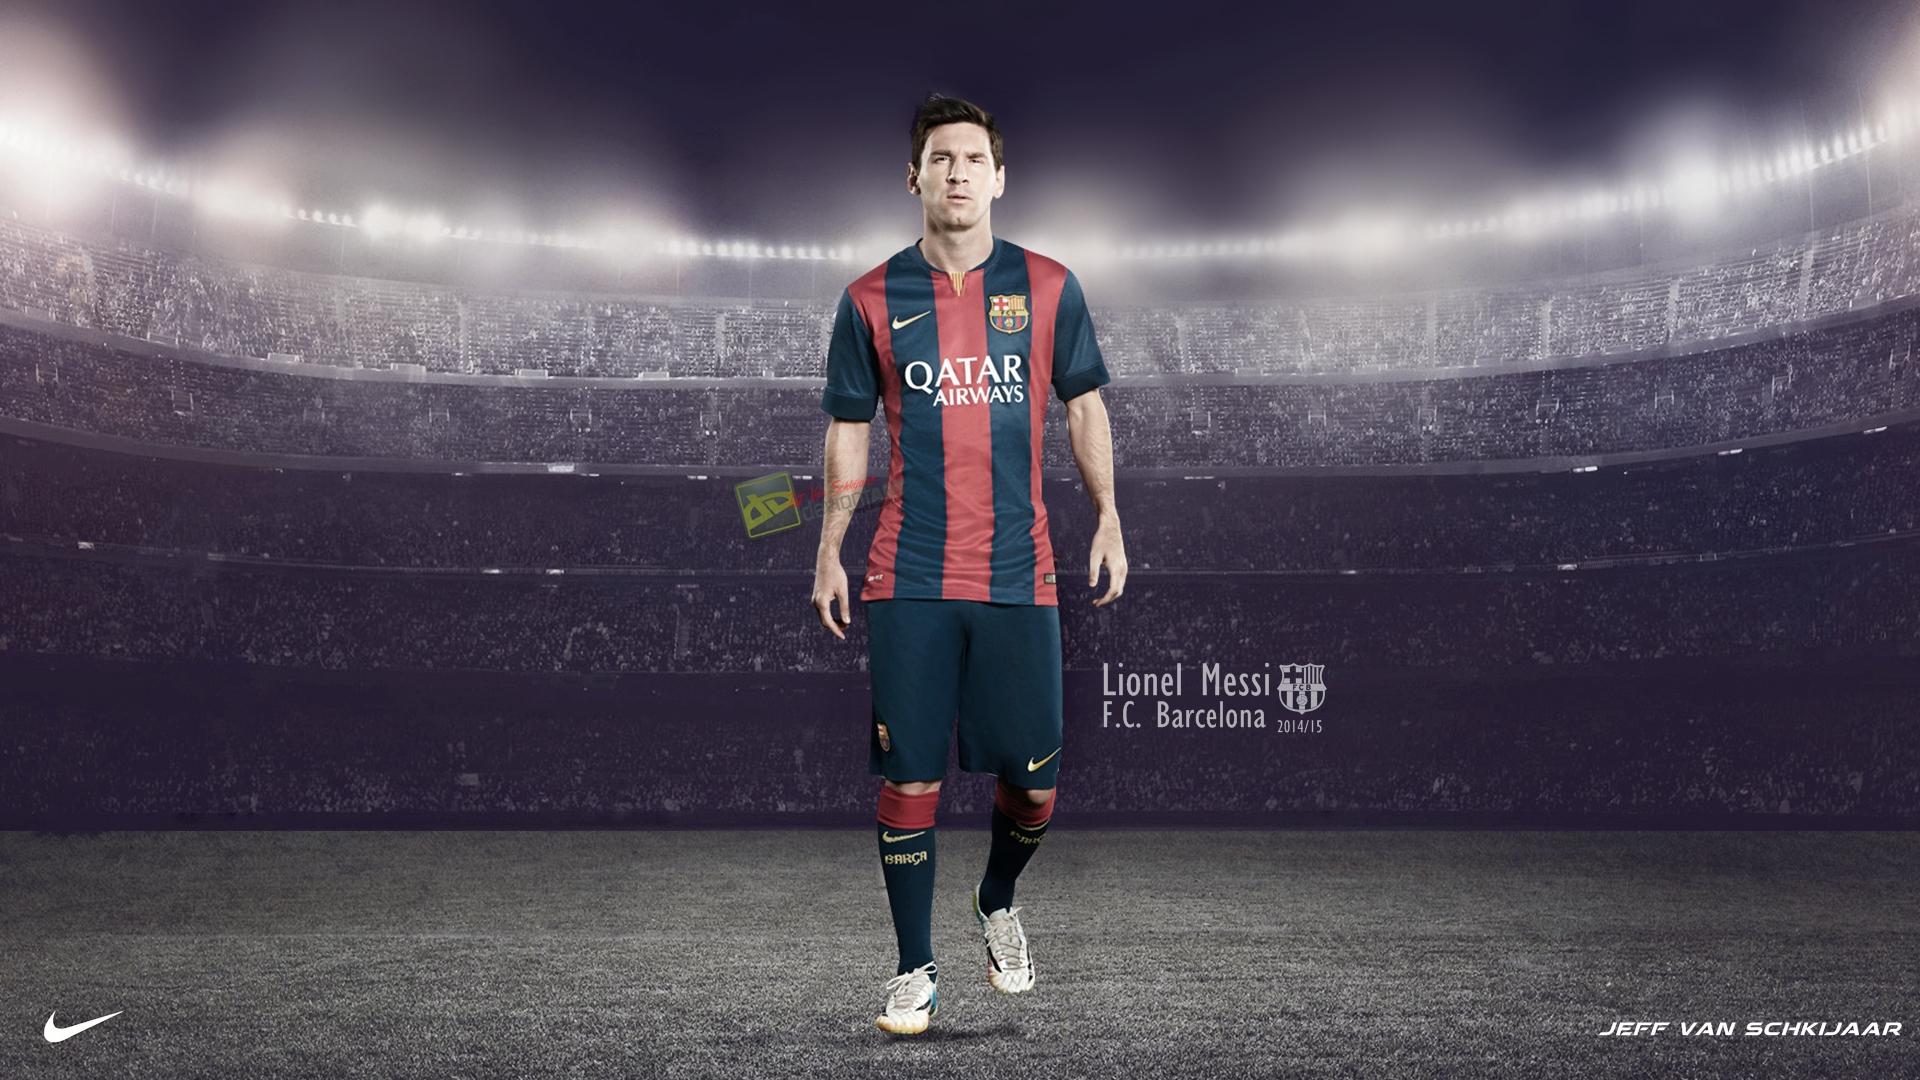 Messi Wallpaper cool